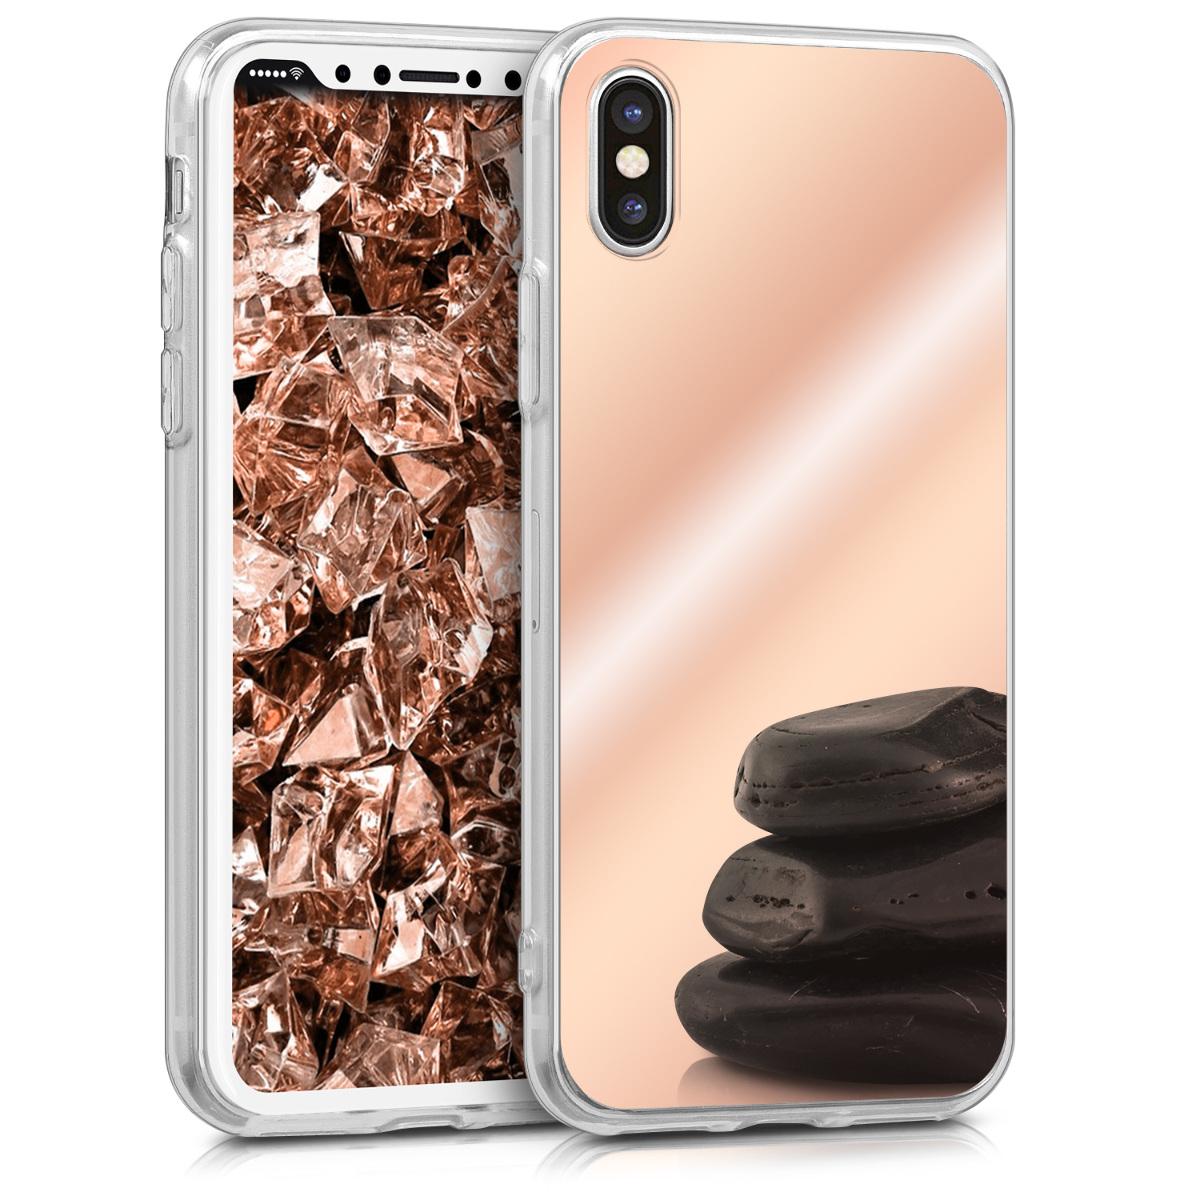 KW Θήκη Σιλικόνης (TPU) με Καθρέφτη iPhone X - Rose Gold Reflective (42510.41)